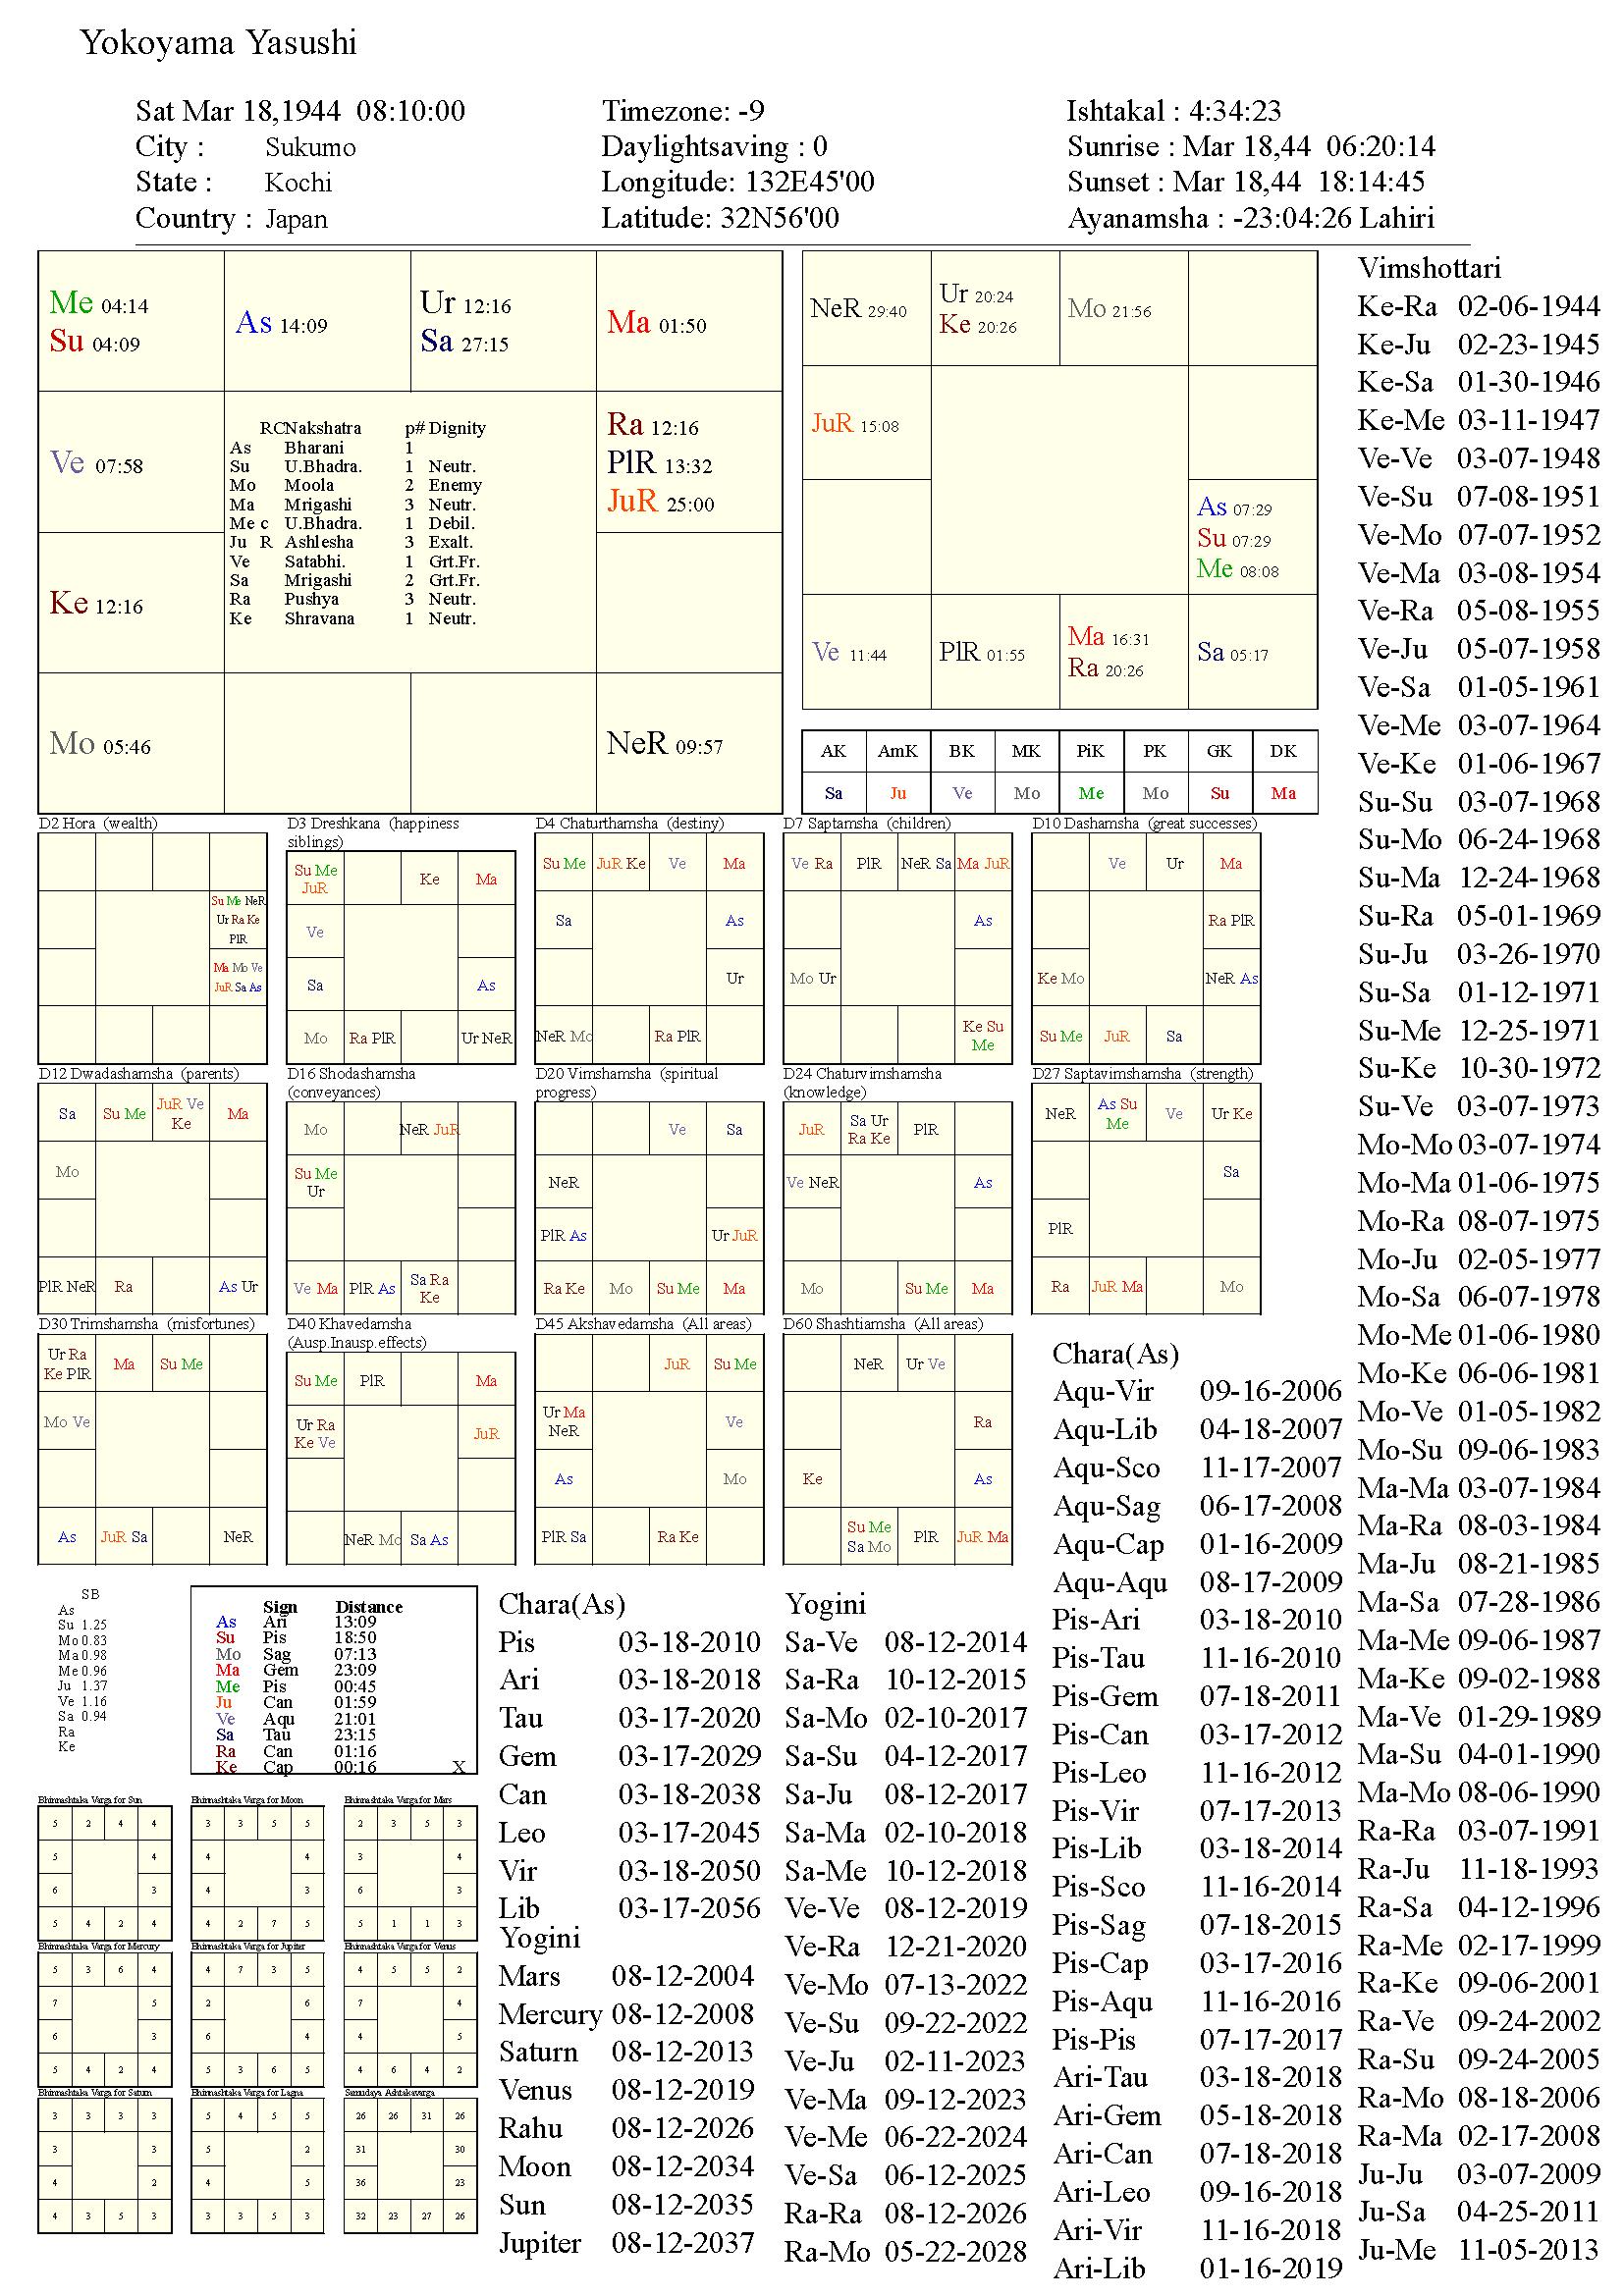 yokoyamayasushi_chart